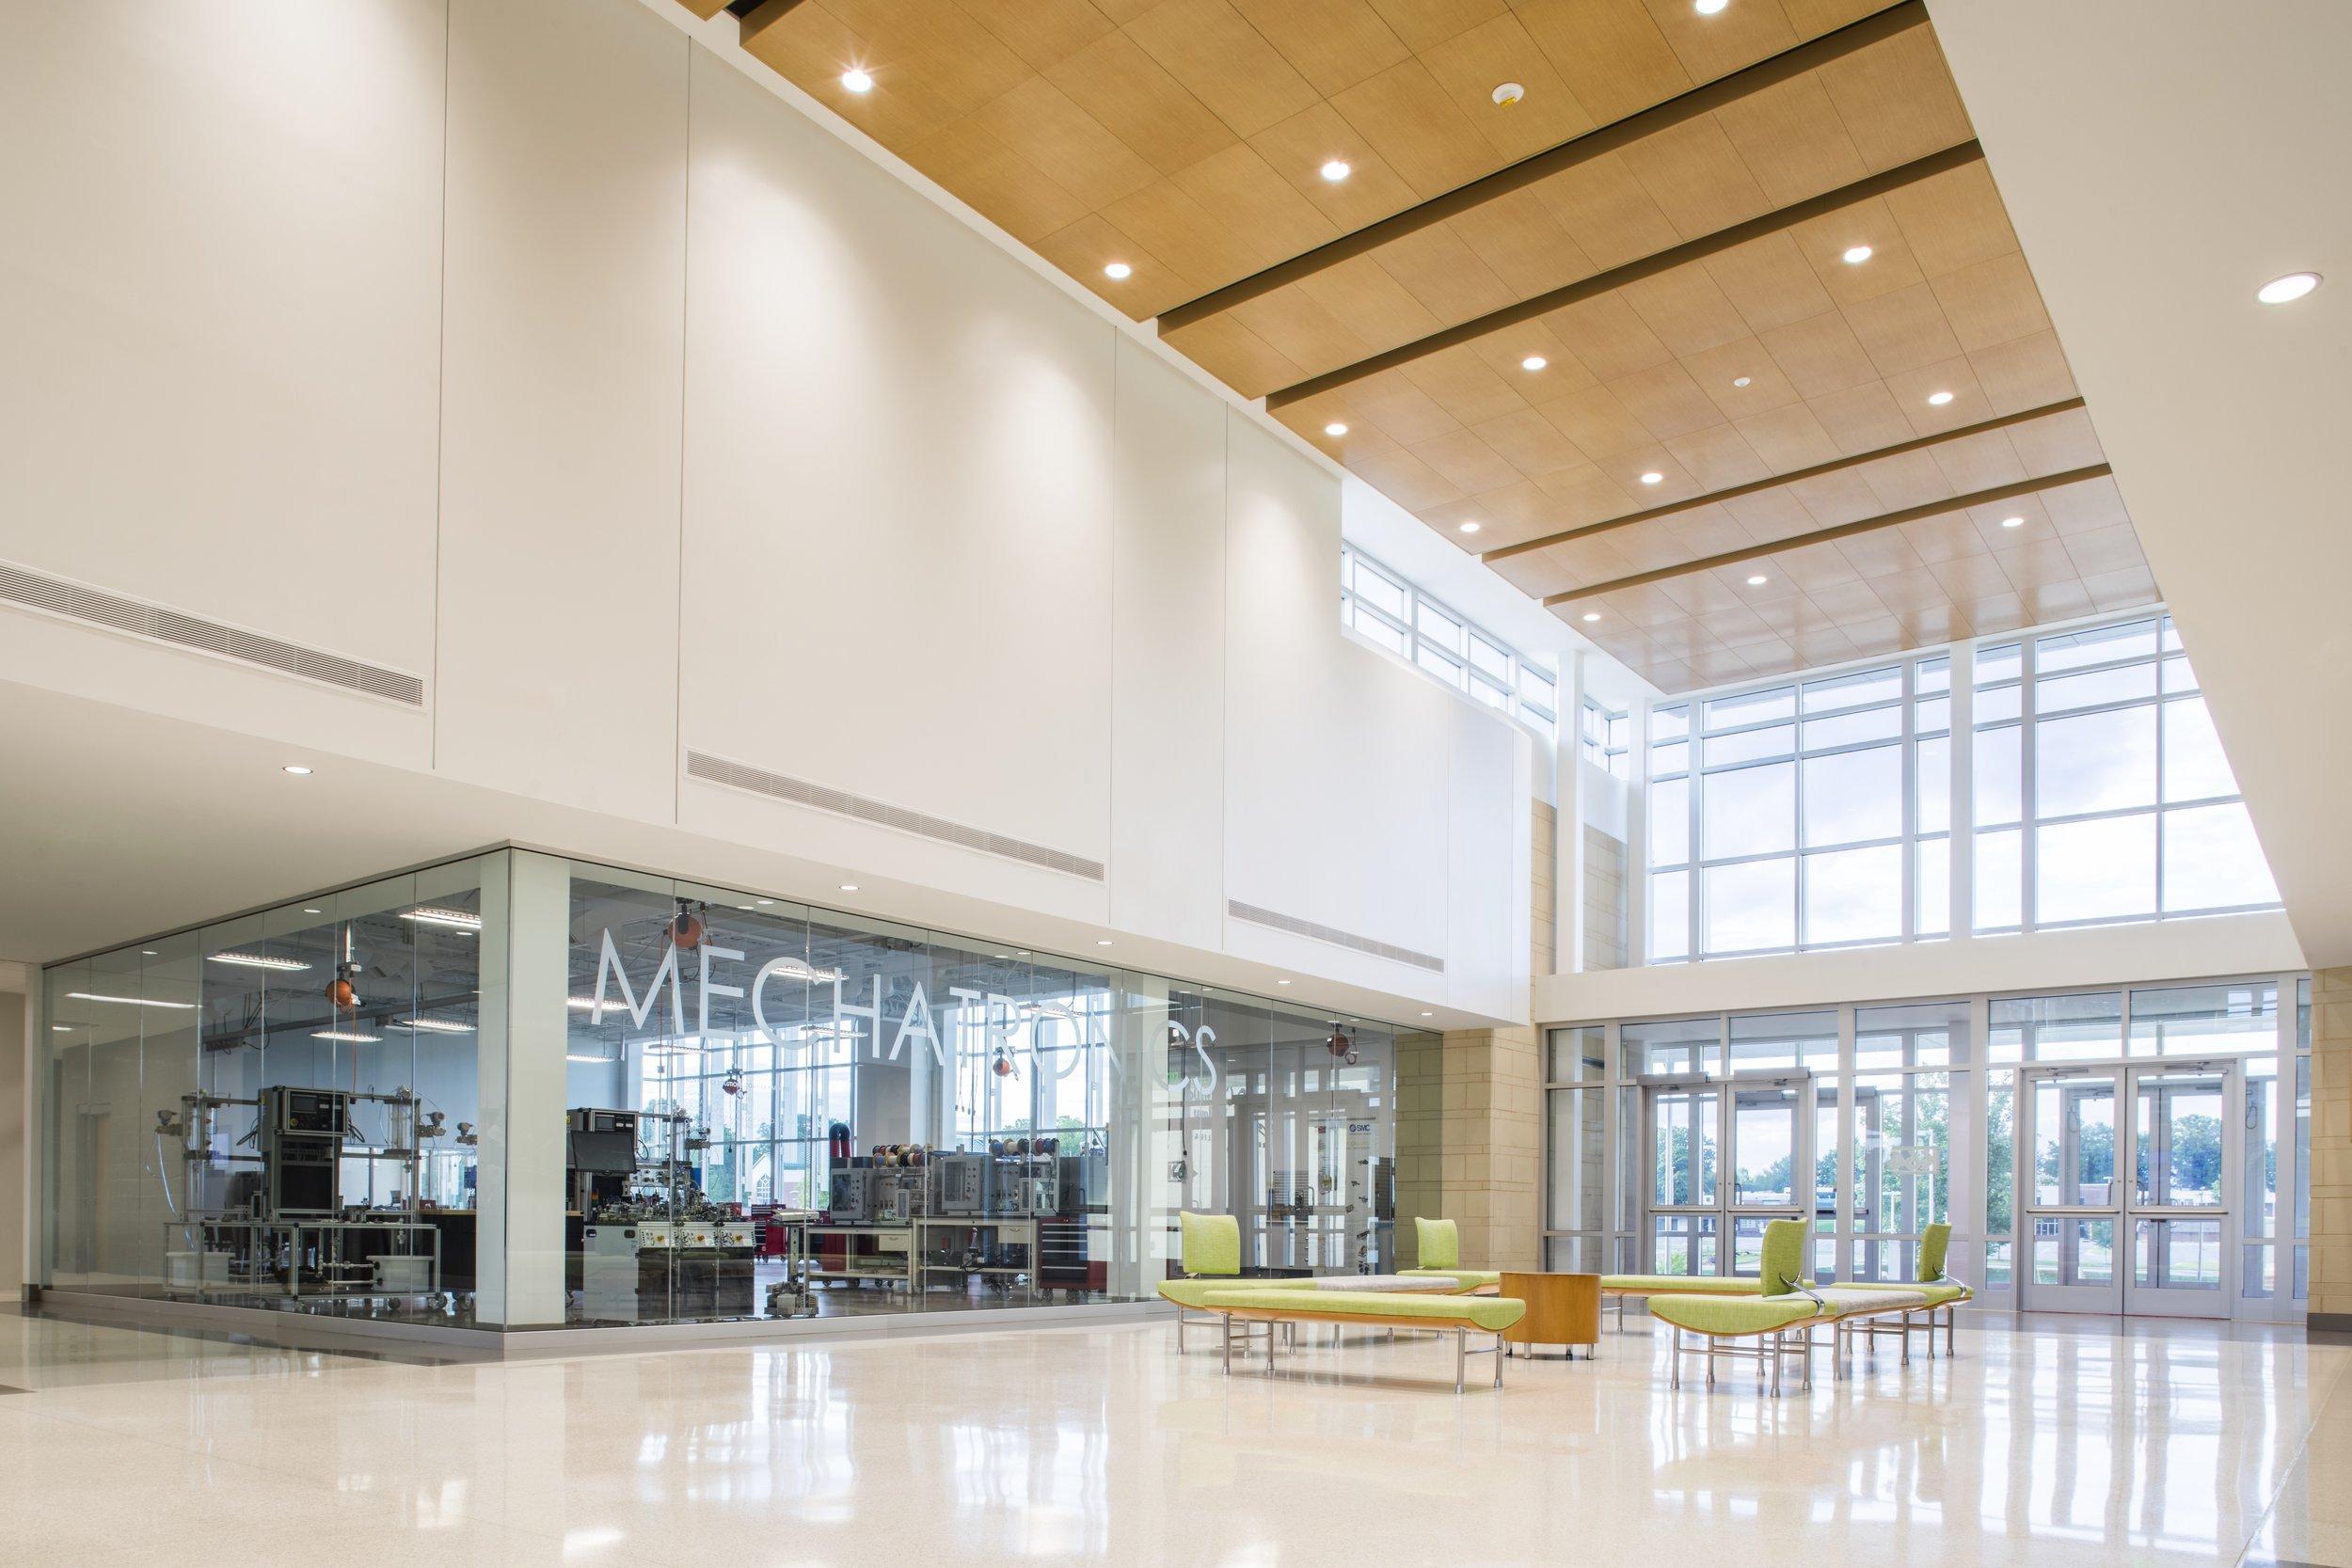 ADW-Higher-Education-CVCC-Hickory-NC-Workforce-Solutions-Interior-Lobby 2.jpg